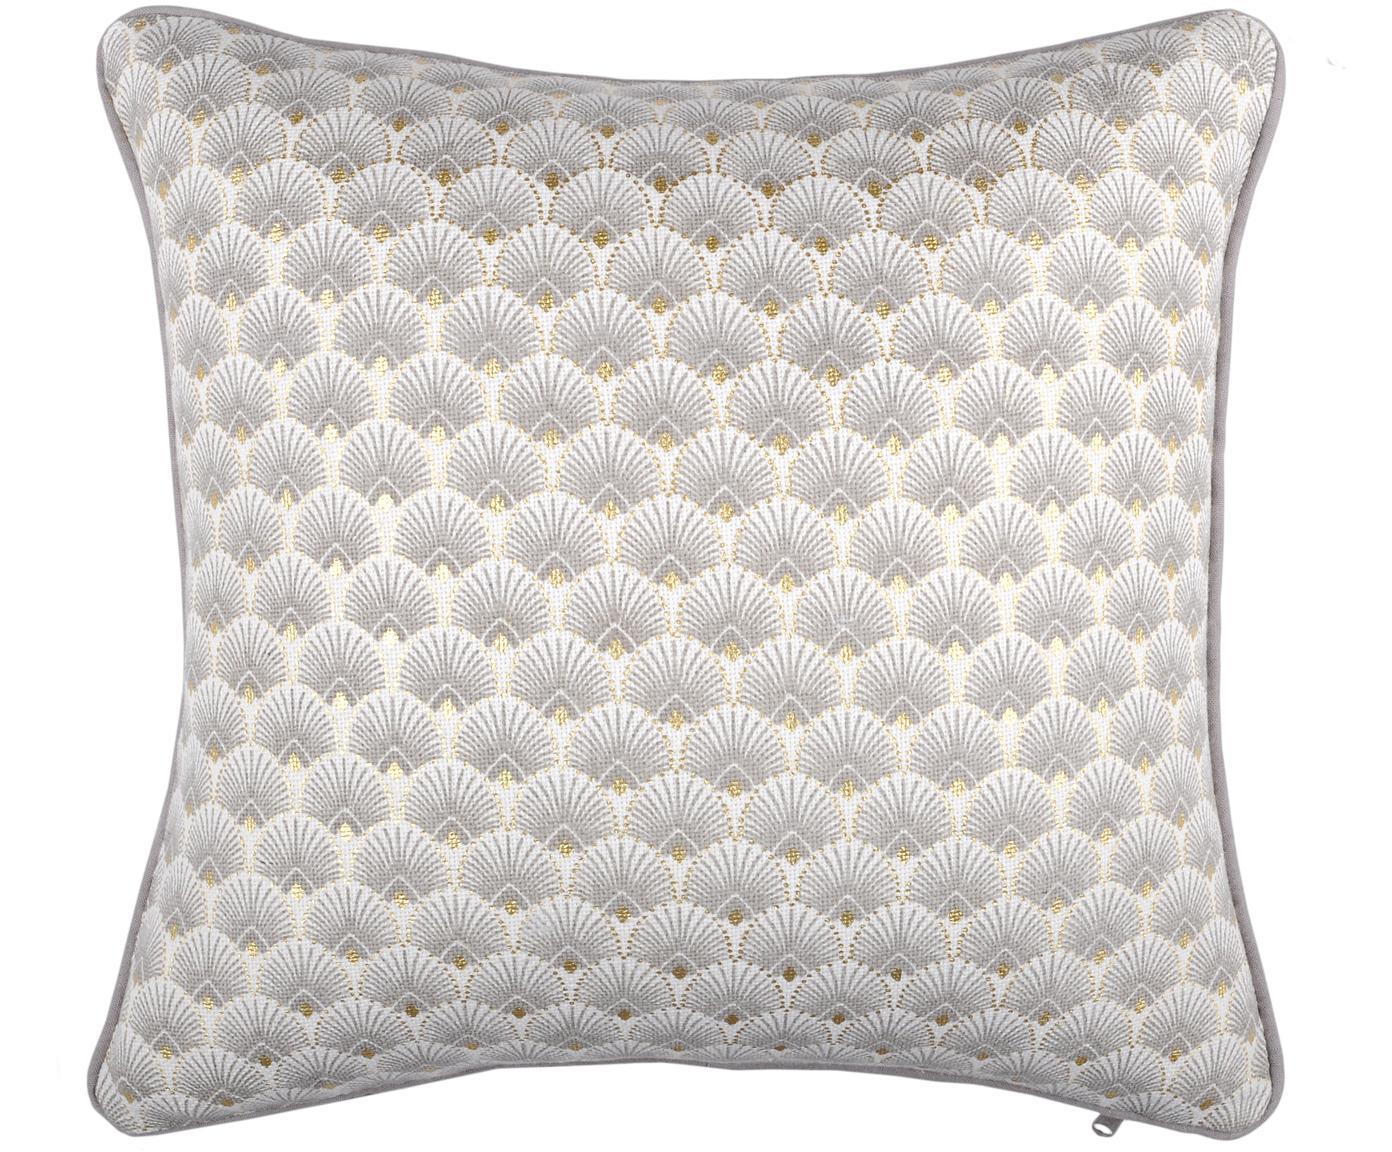 Cuscino con imbottitura Corosol, Cotone, Grigio, oro, Larg. 40 x Lung. 40 cm